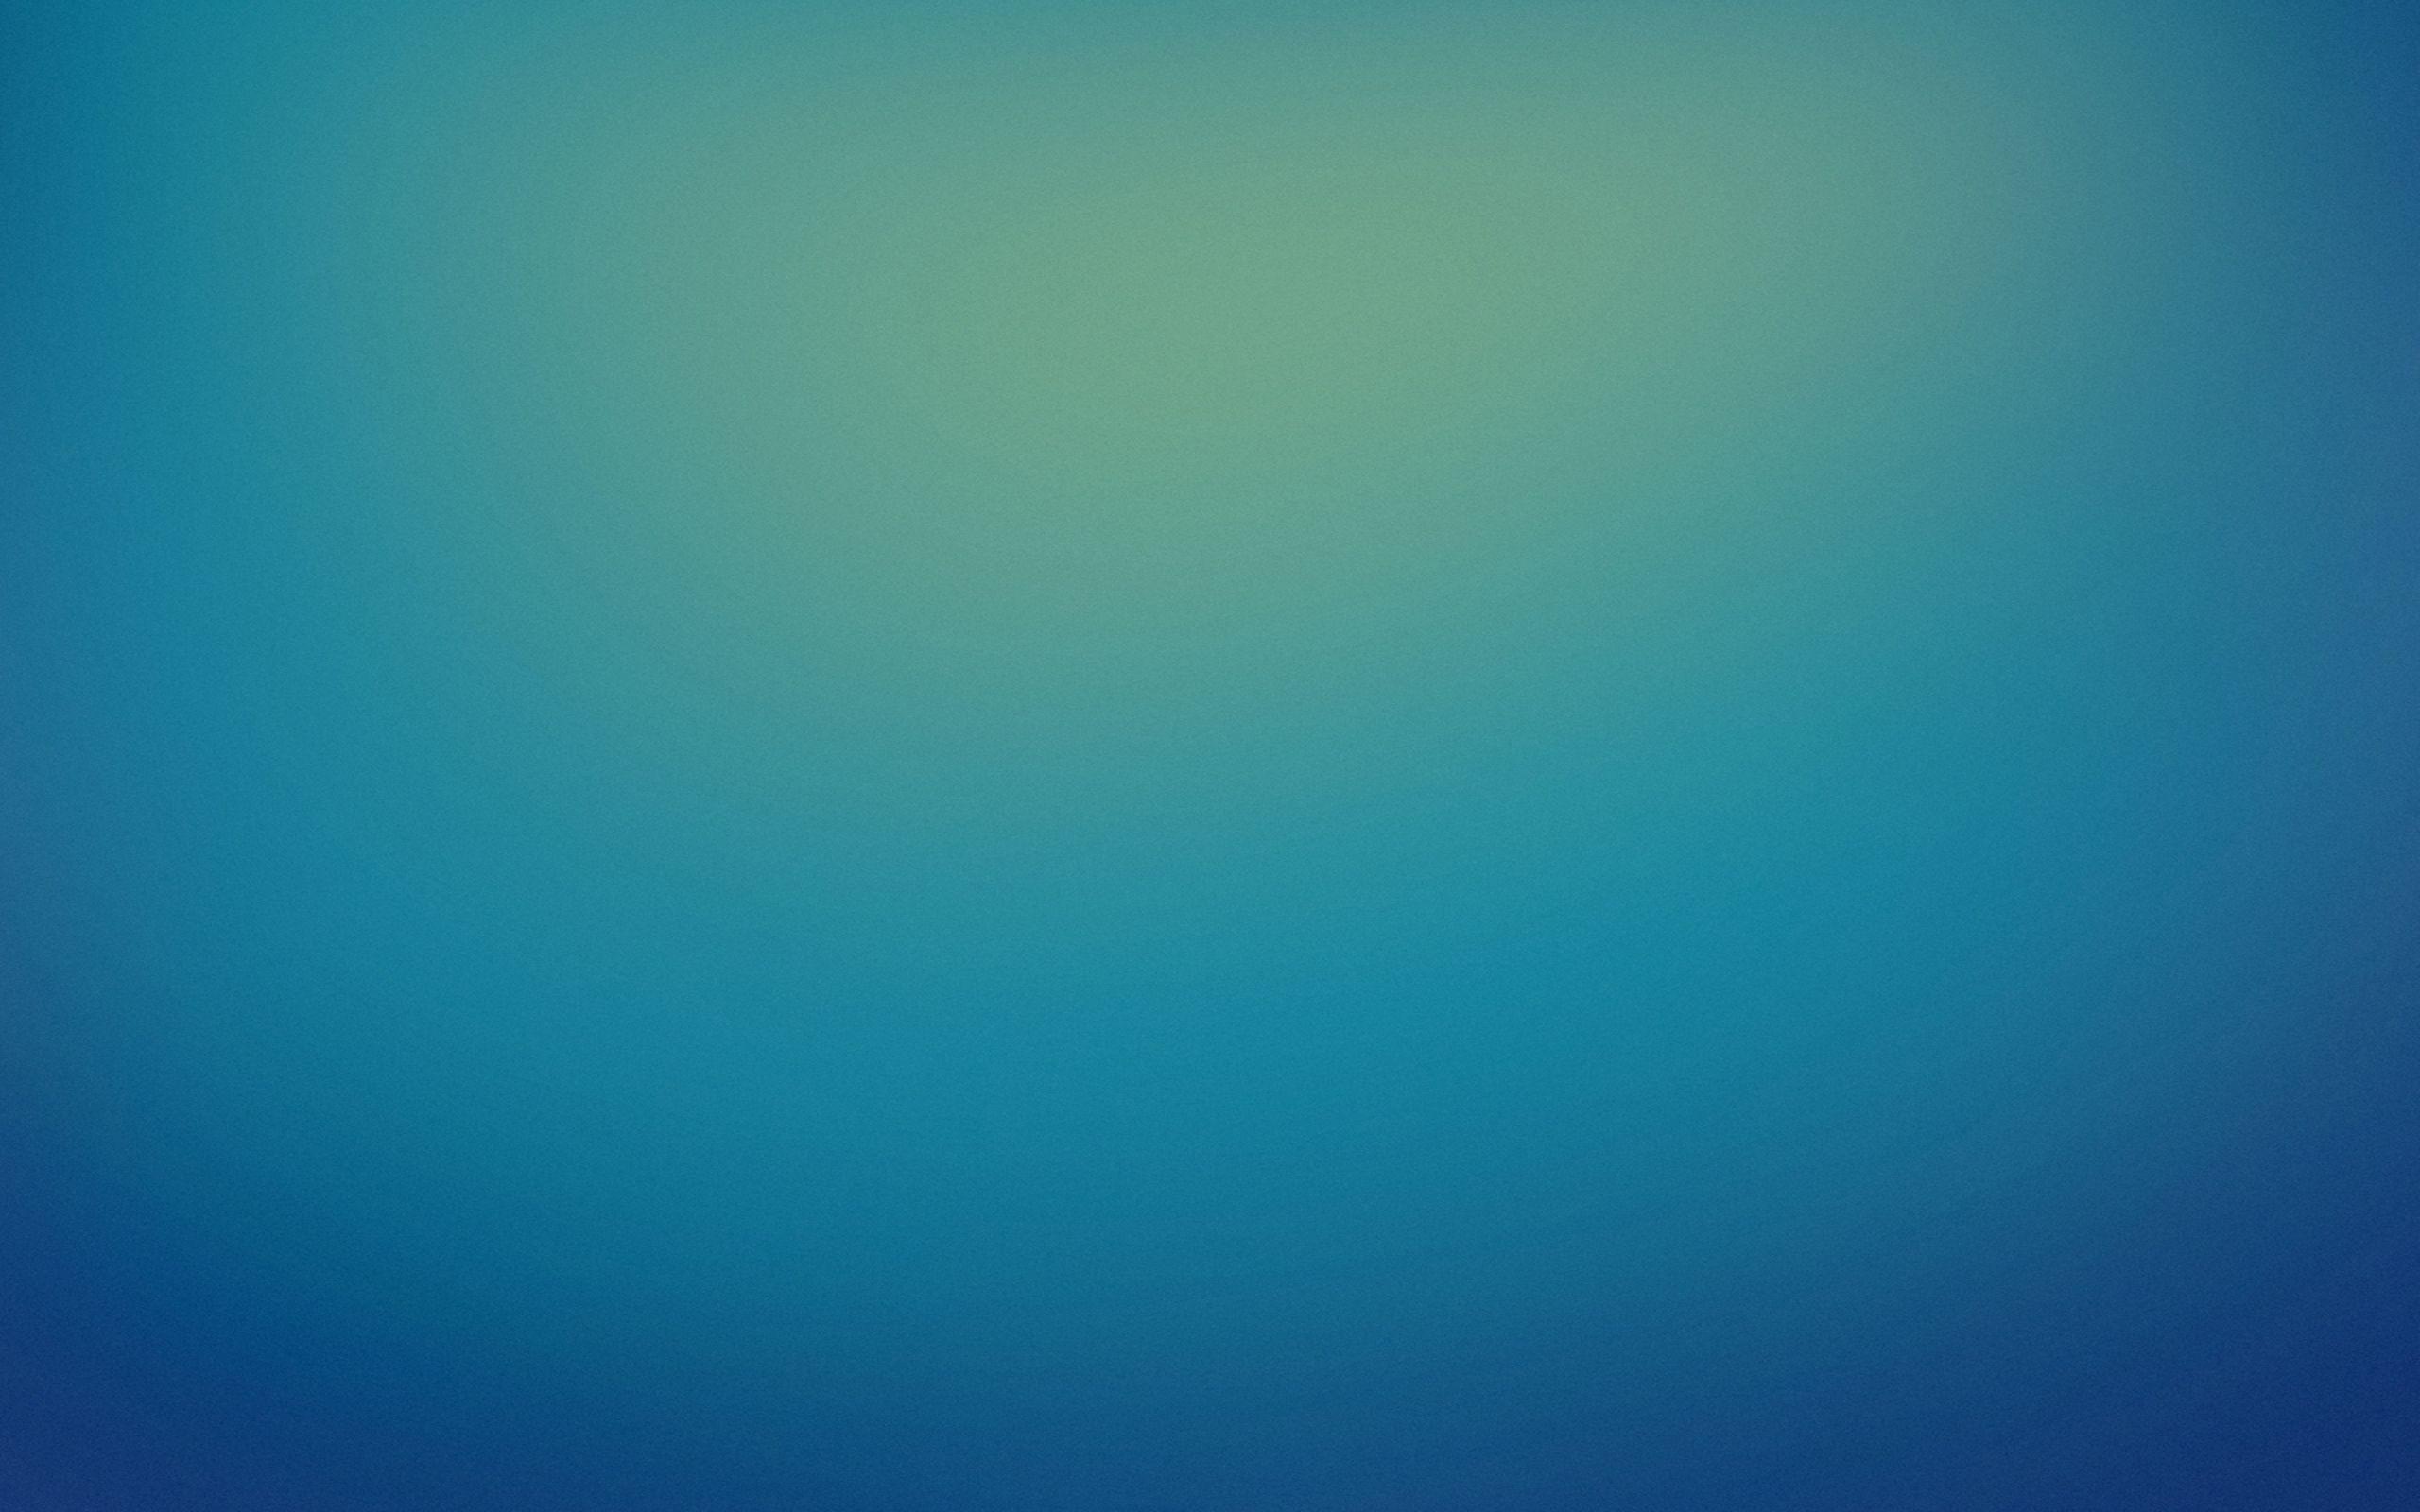 Лева Би-2 | Рок-музыка, Музыка, Мужчины | 1600x2560